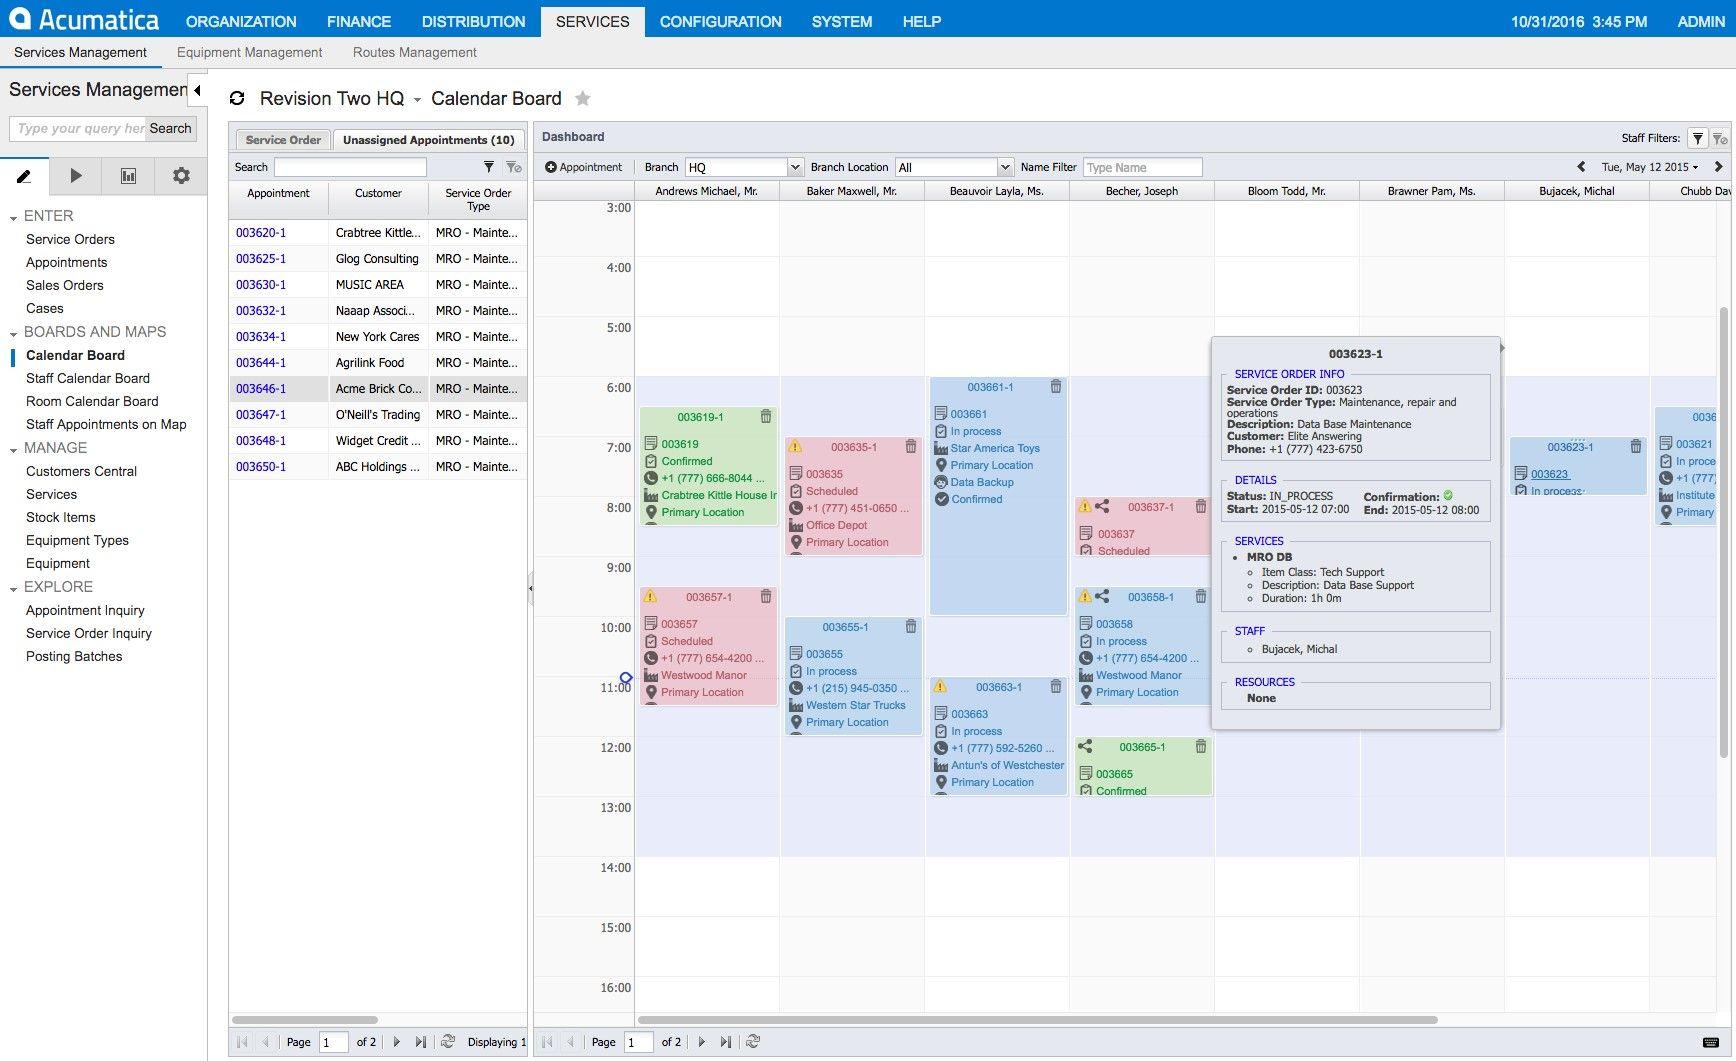 Acumatica Cloud ERP: Field Services Edition